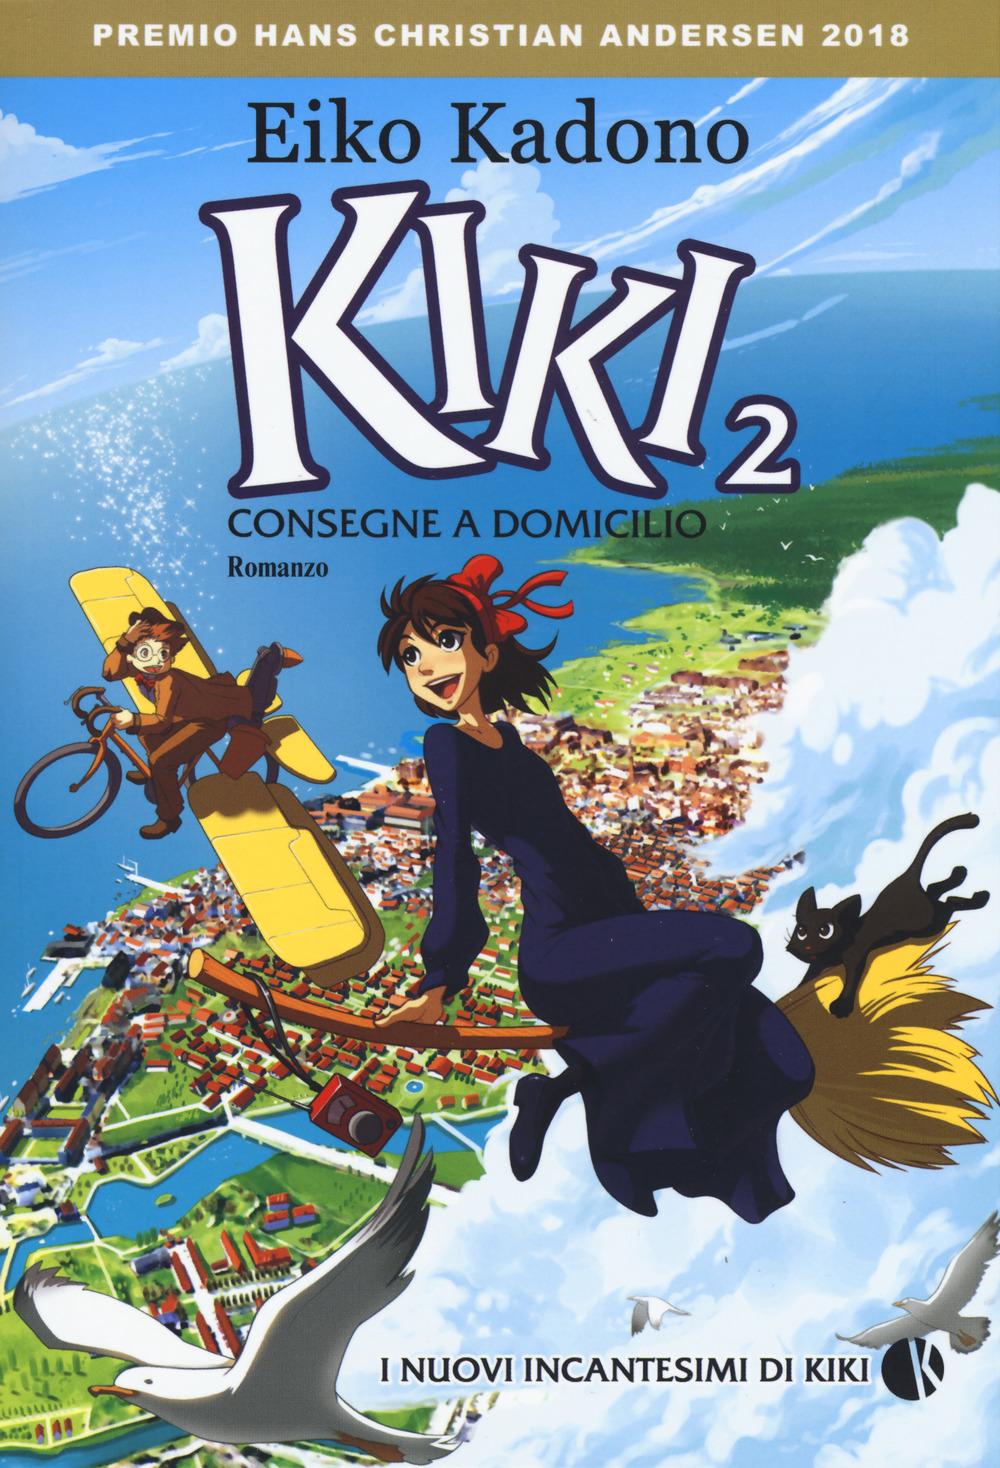 Kiki. Consegne a domicilio. Vol. 2: I nuovi incantesimi di Kiki - Kadono Eiko - 9788885457164